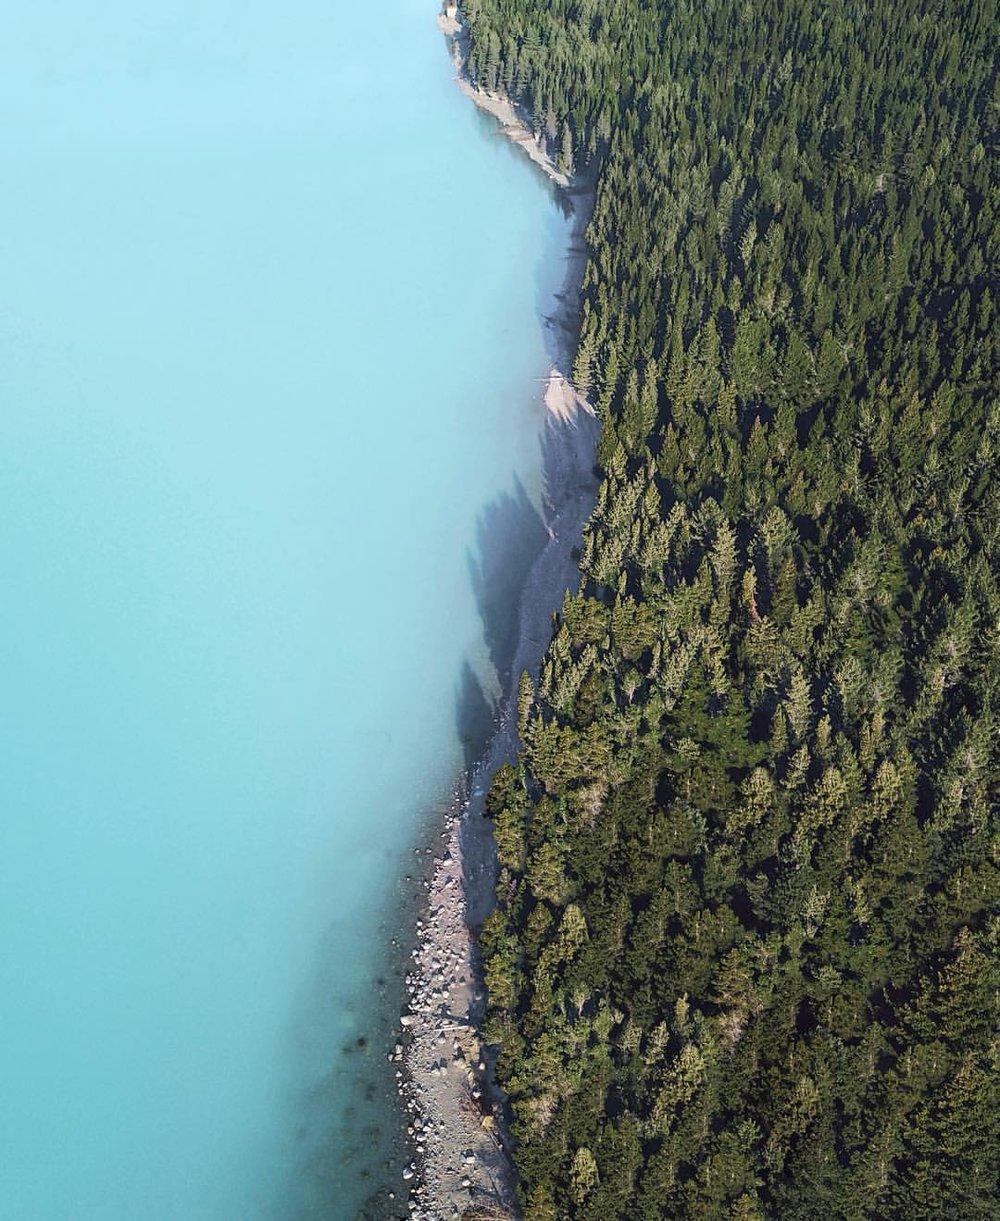 landscape_drone_photograhy_26.jpg